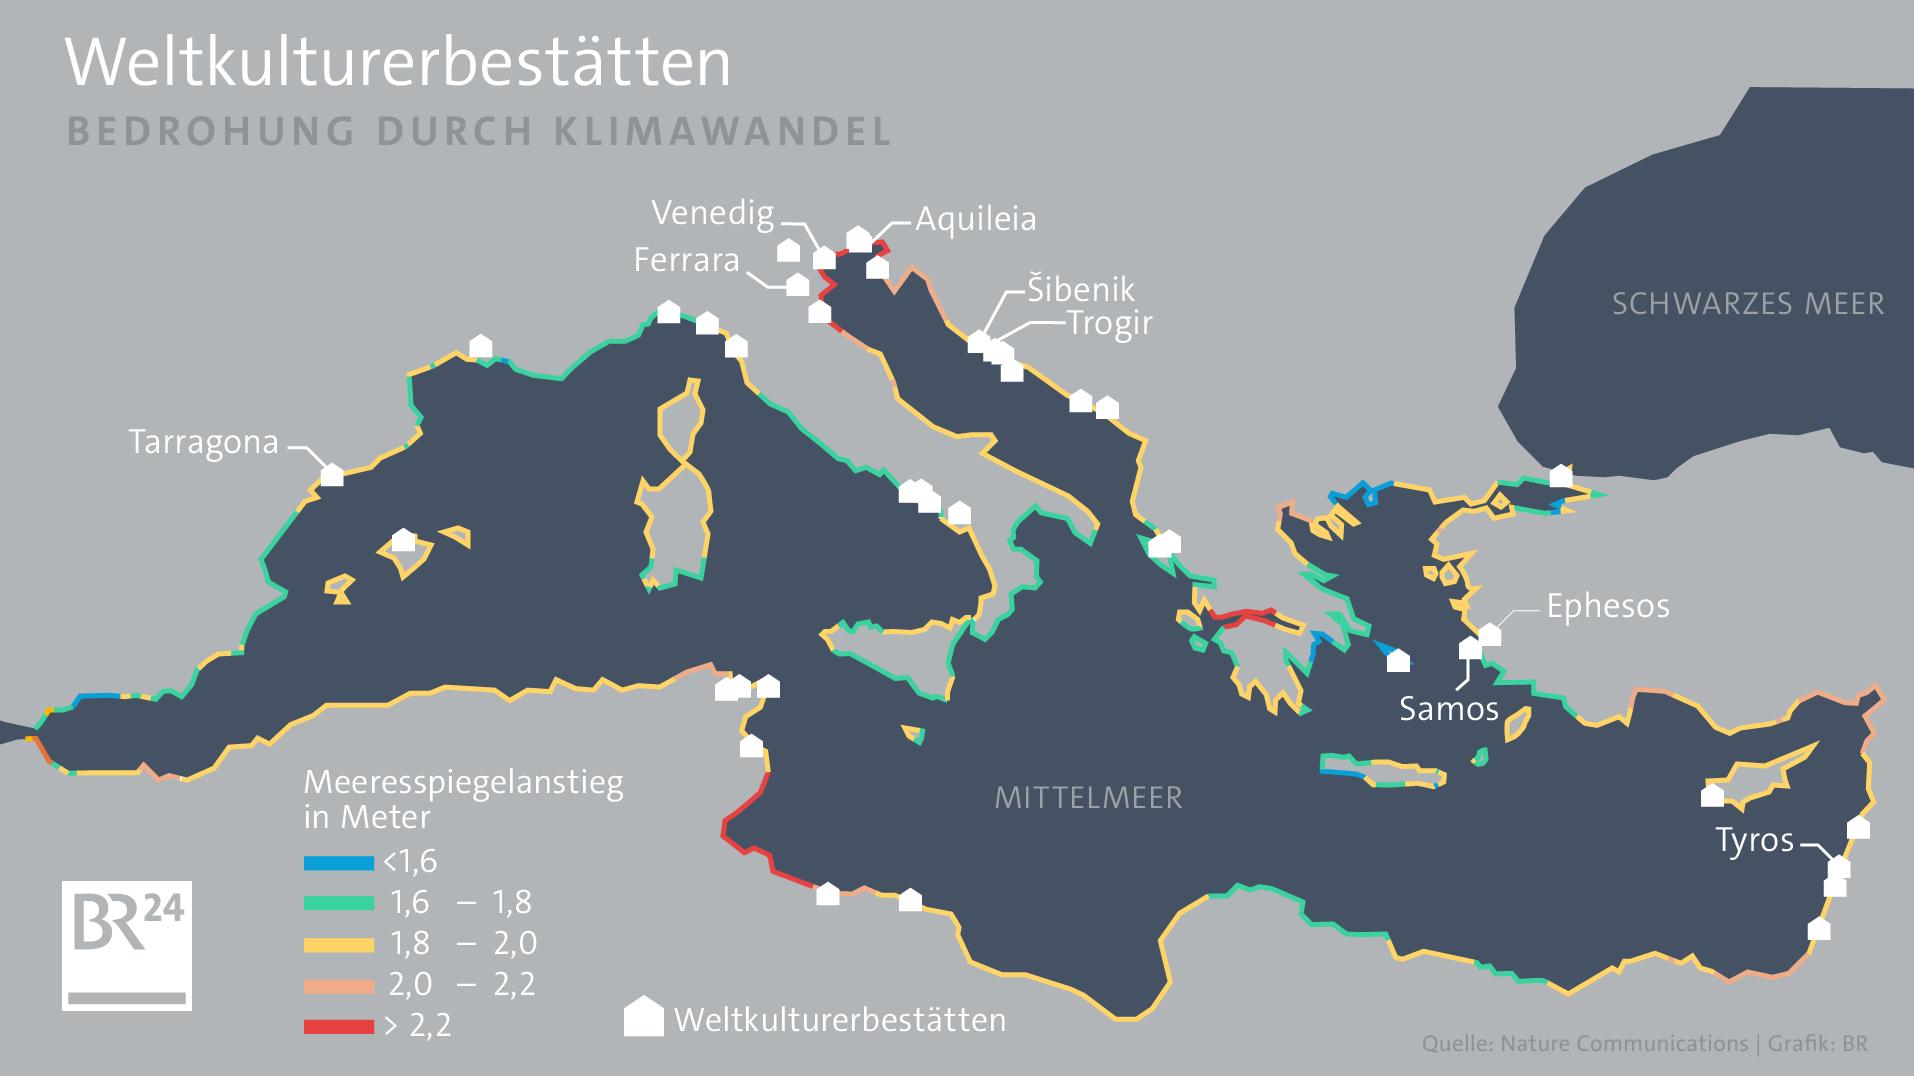 Karte über bedrohte Weltkulturerbestätten durch den Klimawandel